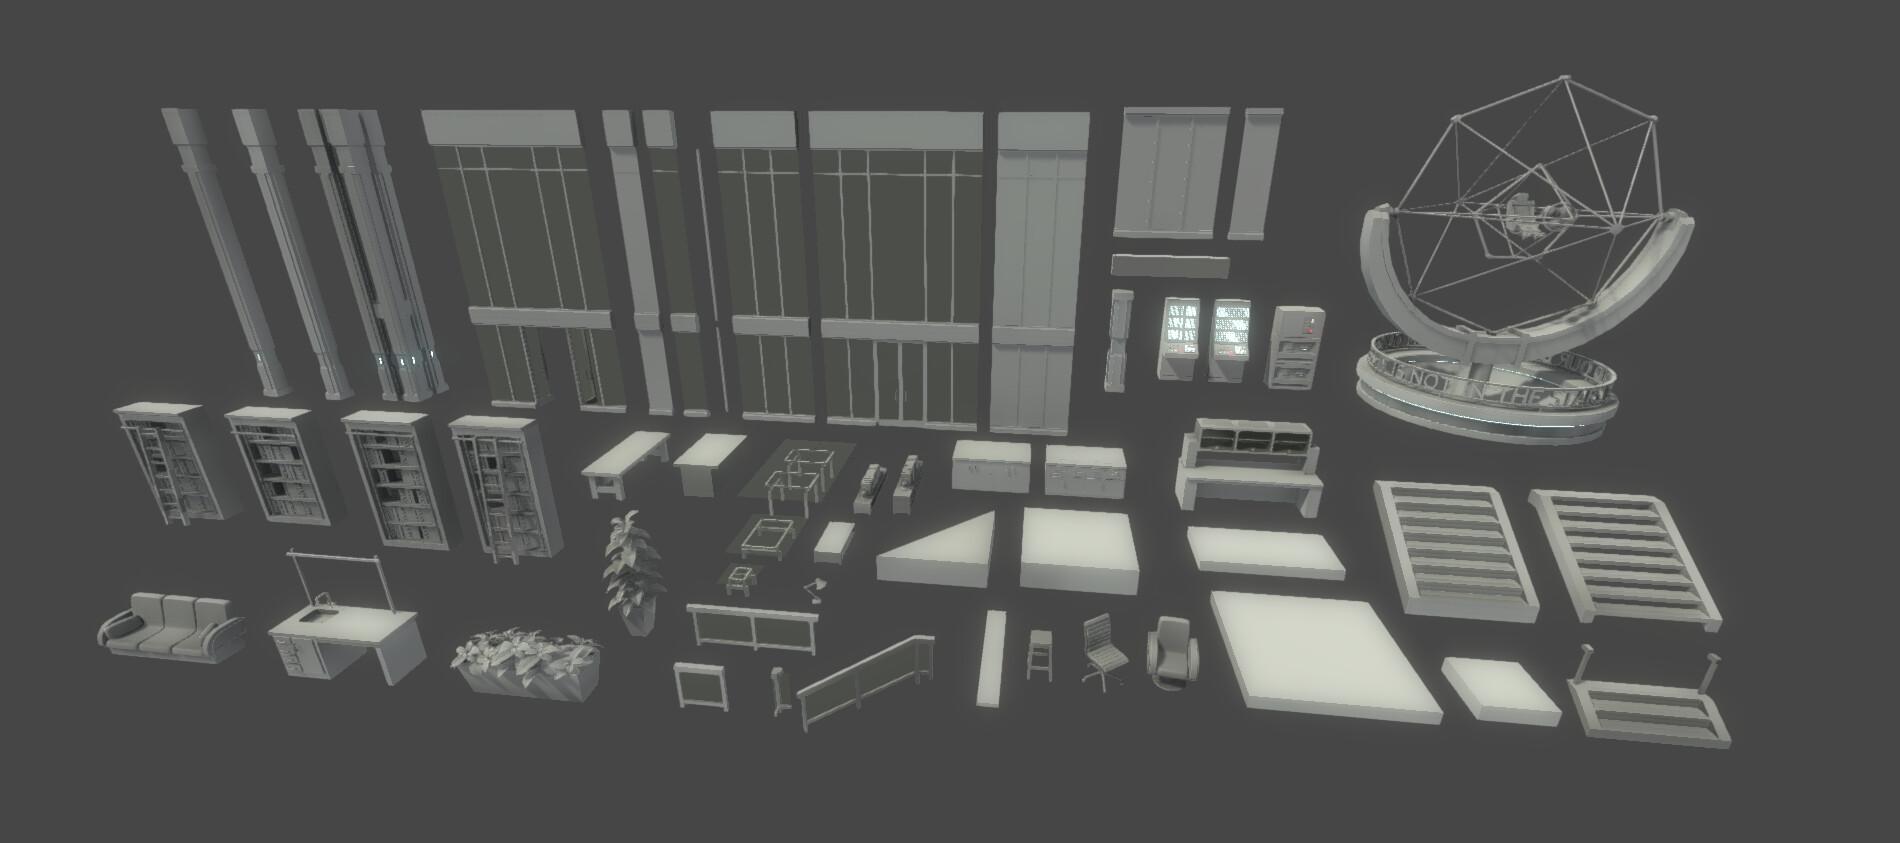 Christopher miller lab layout 09